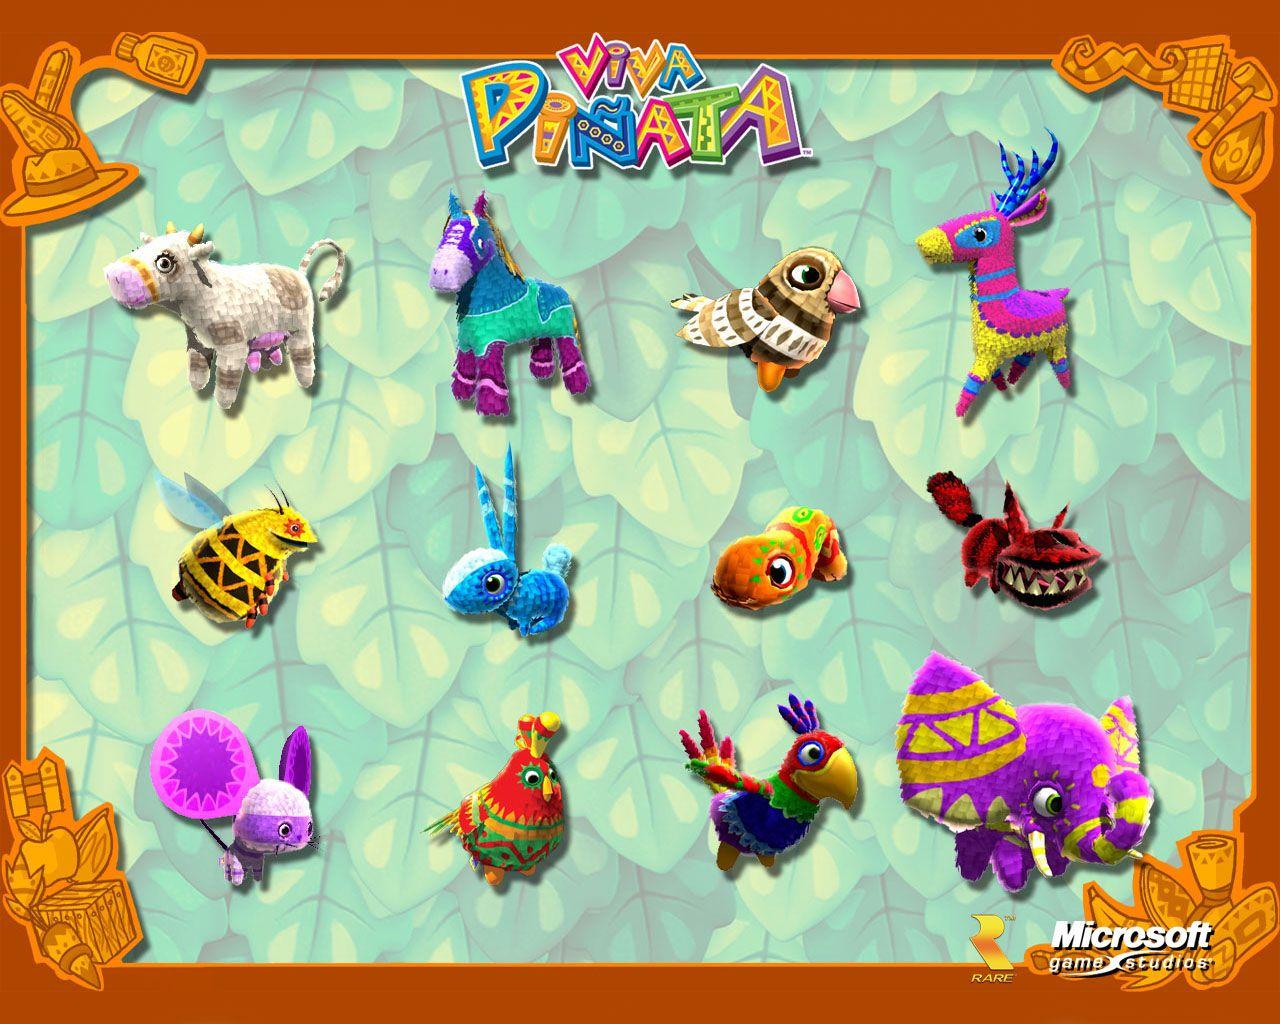 Viva Pinata Wallpaper 03 Free Download Wallpaper Games Daily Free Games Wallpaper On Dailyfreegames Com Geeky Games Pinata Game Pictures